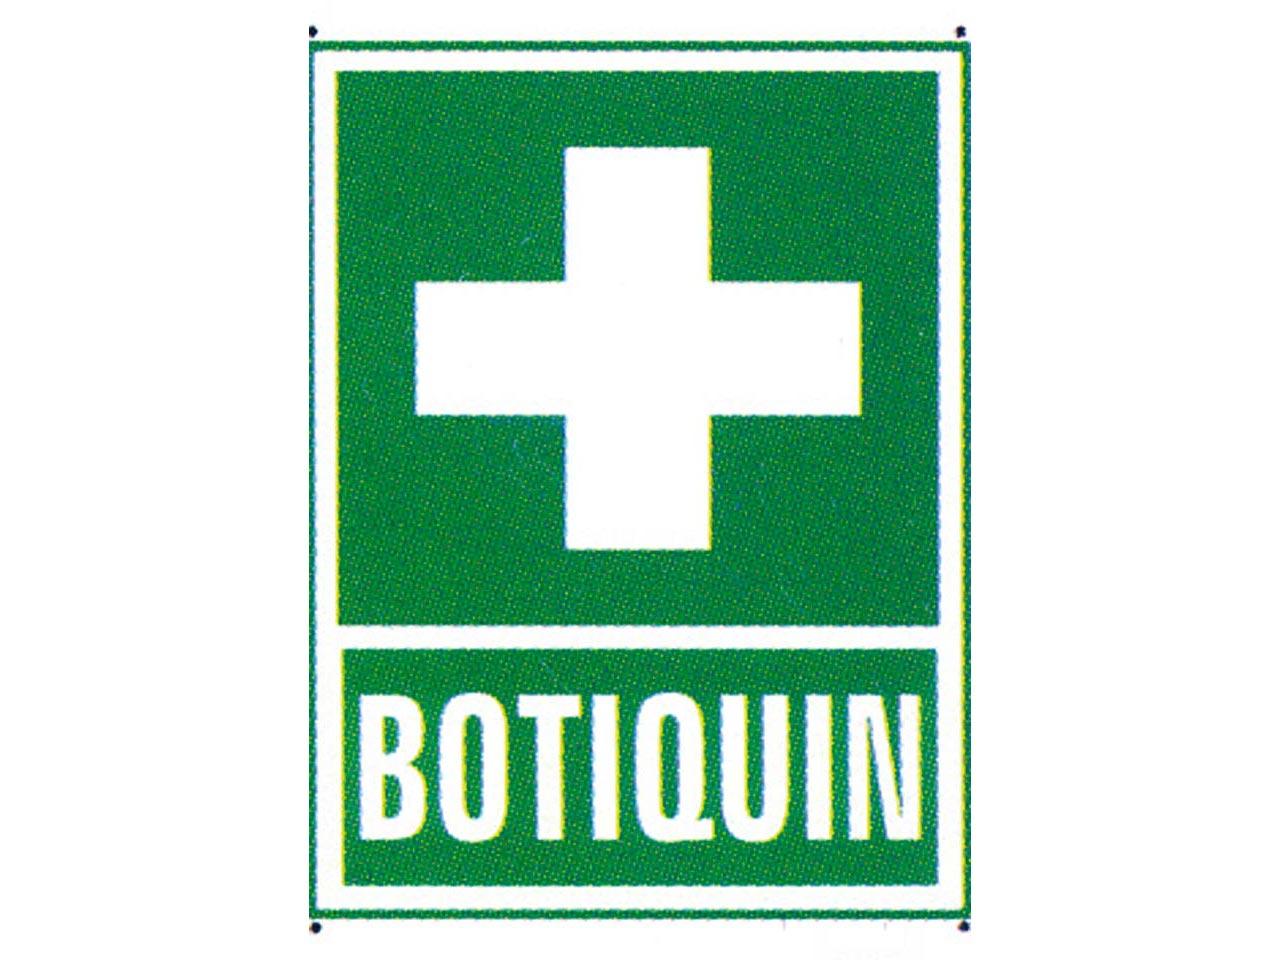 Imagenes De Botiquin Para Baño:SUFERSA